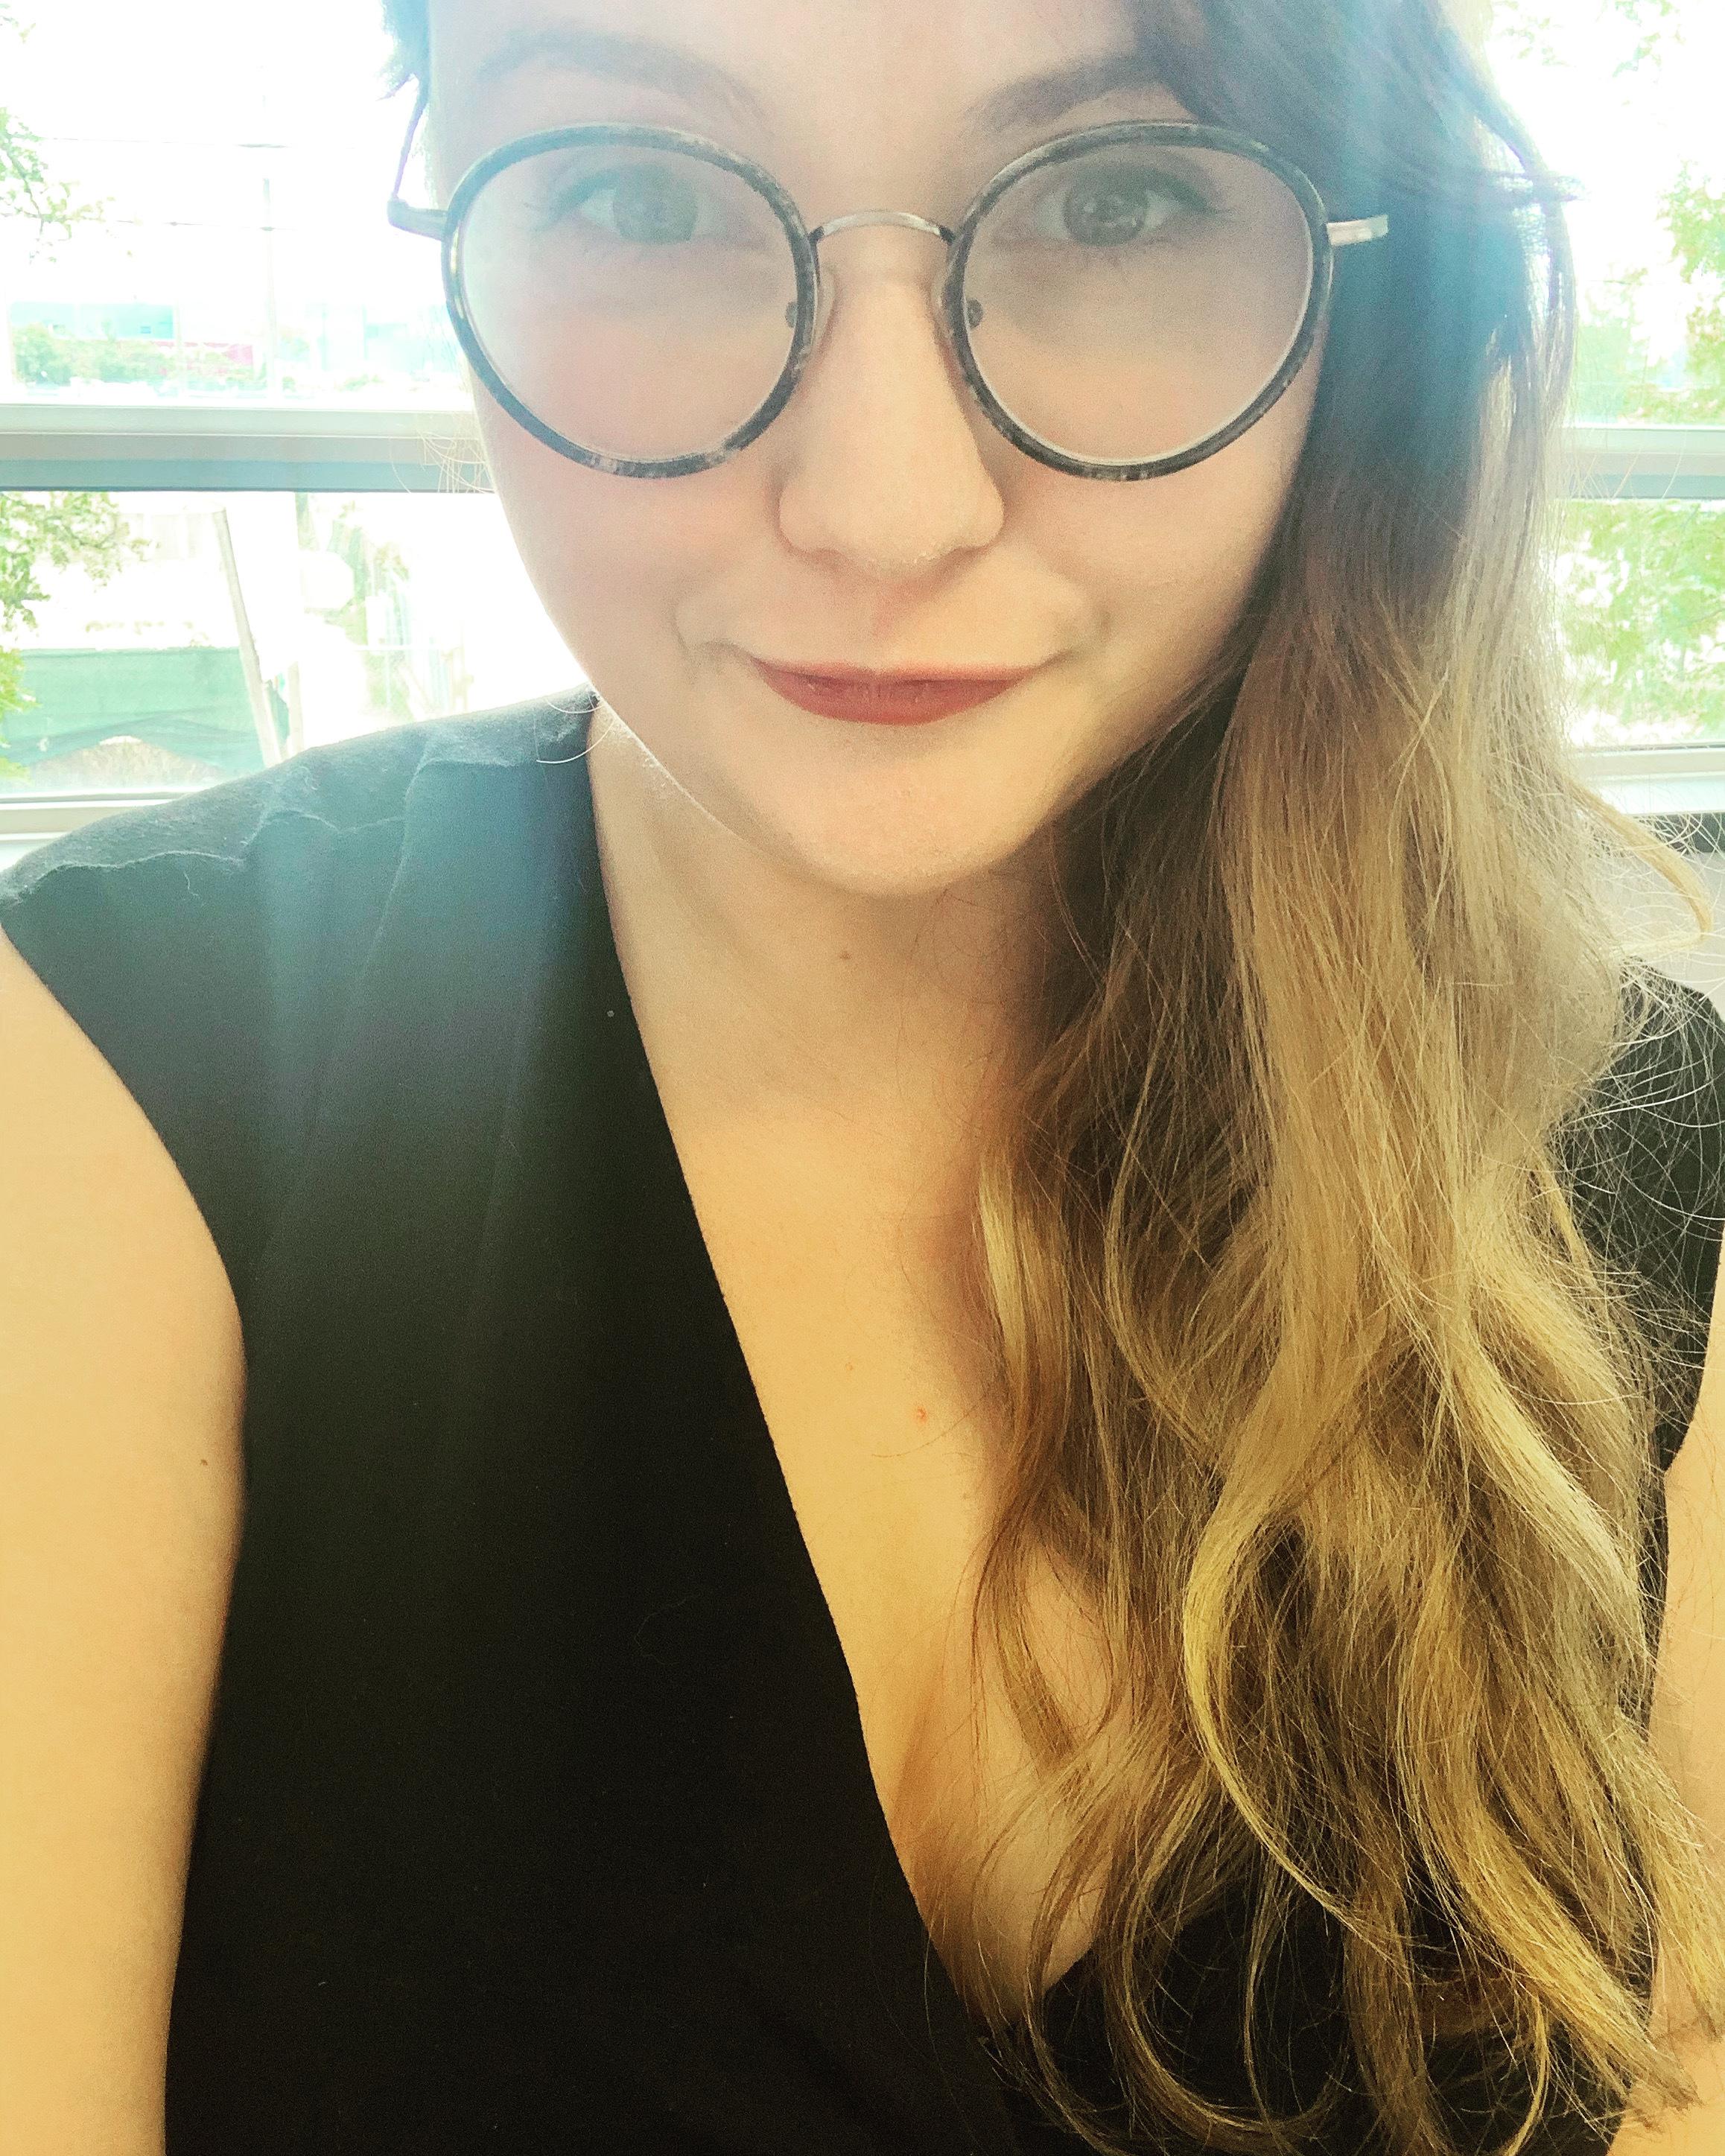 SugarBaby profile Girlnextdoor94!